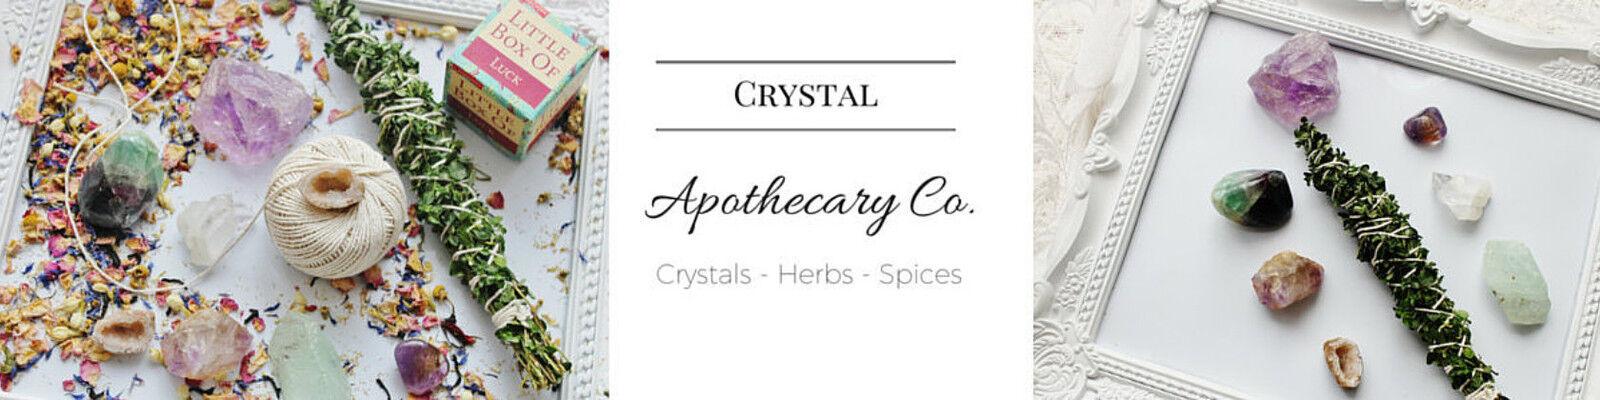 Crystal Apothecary Co